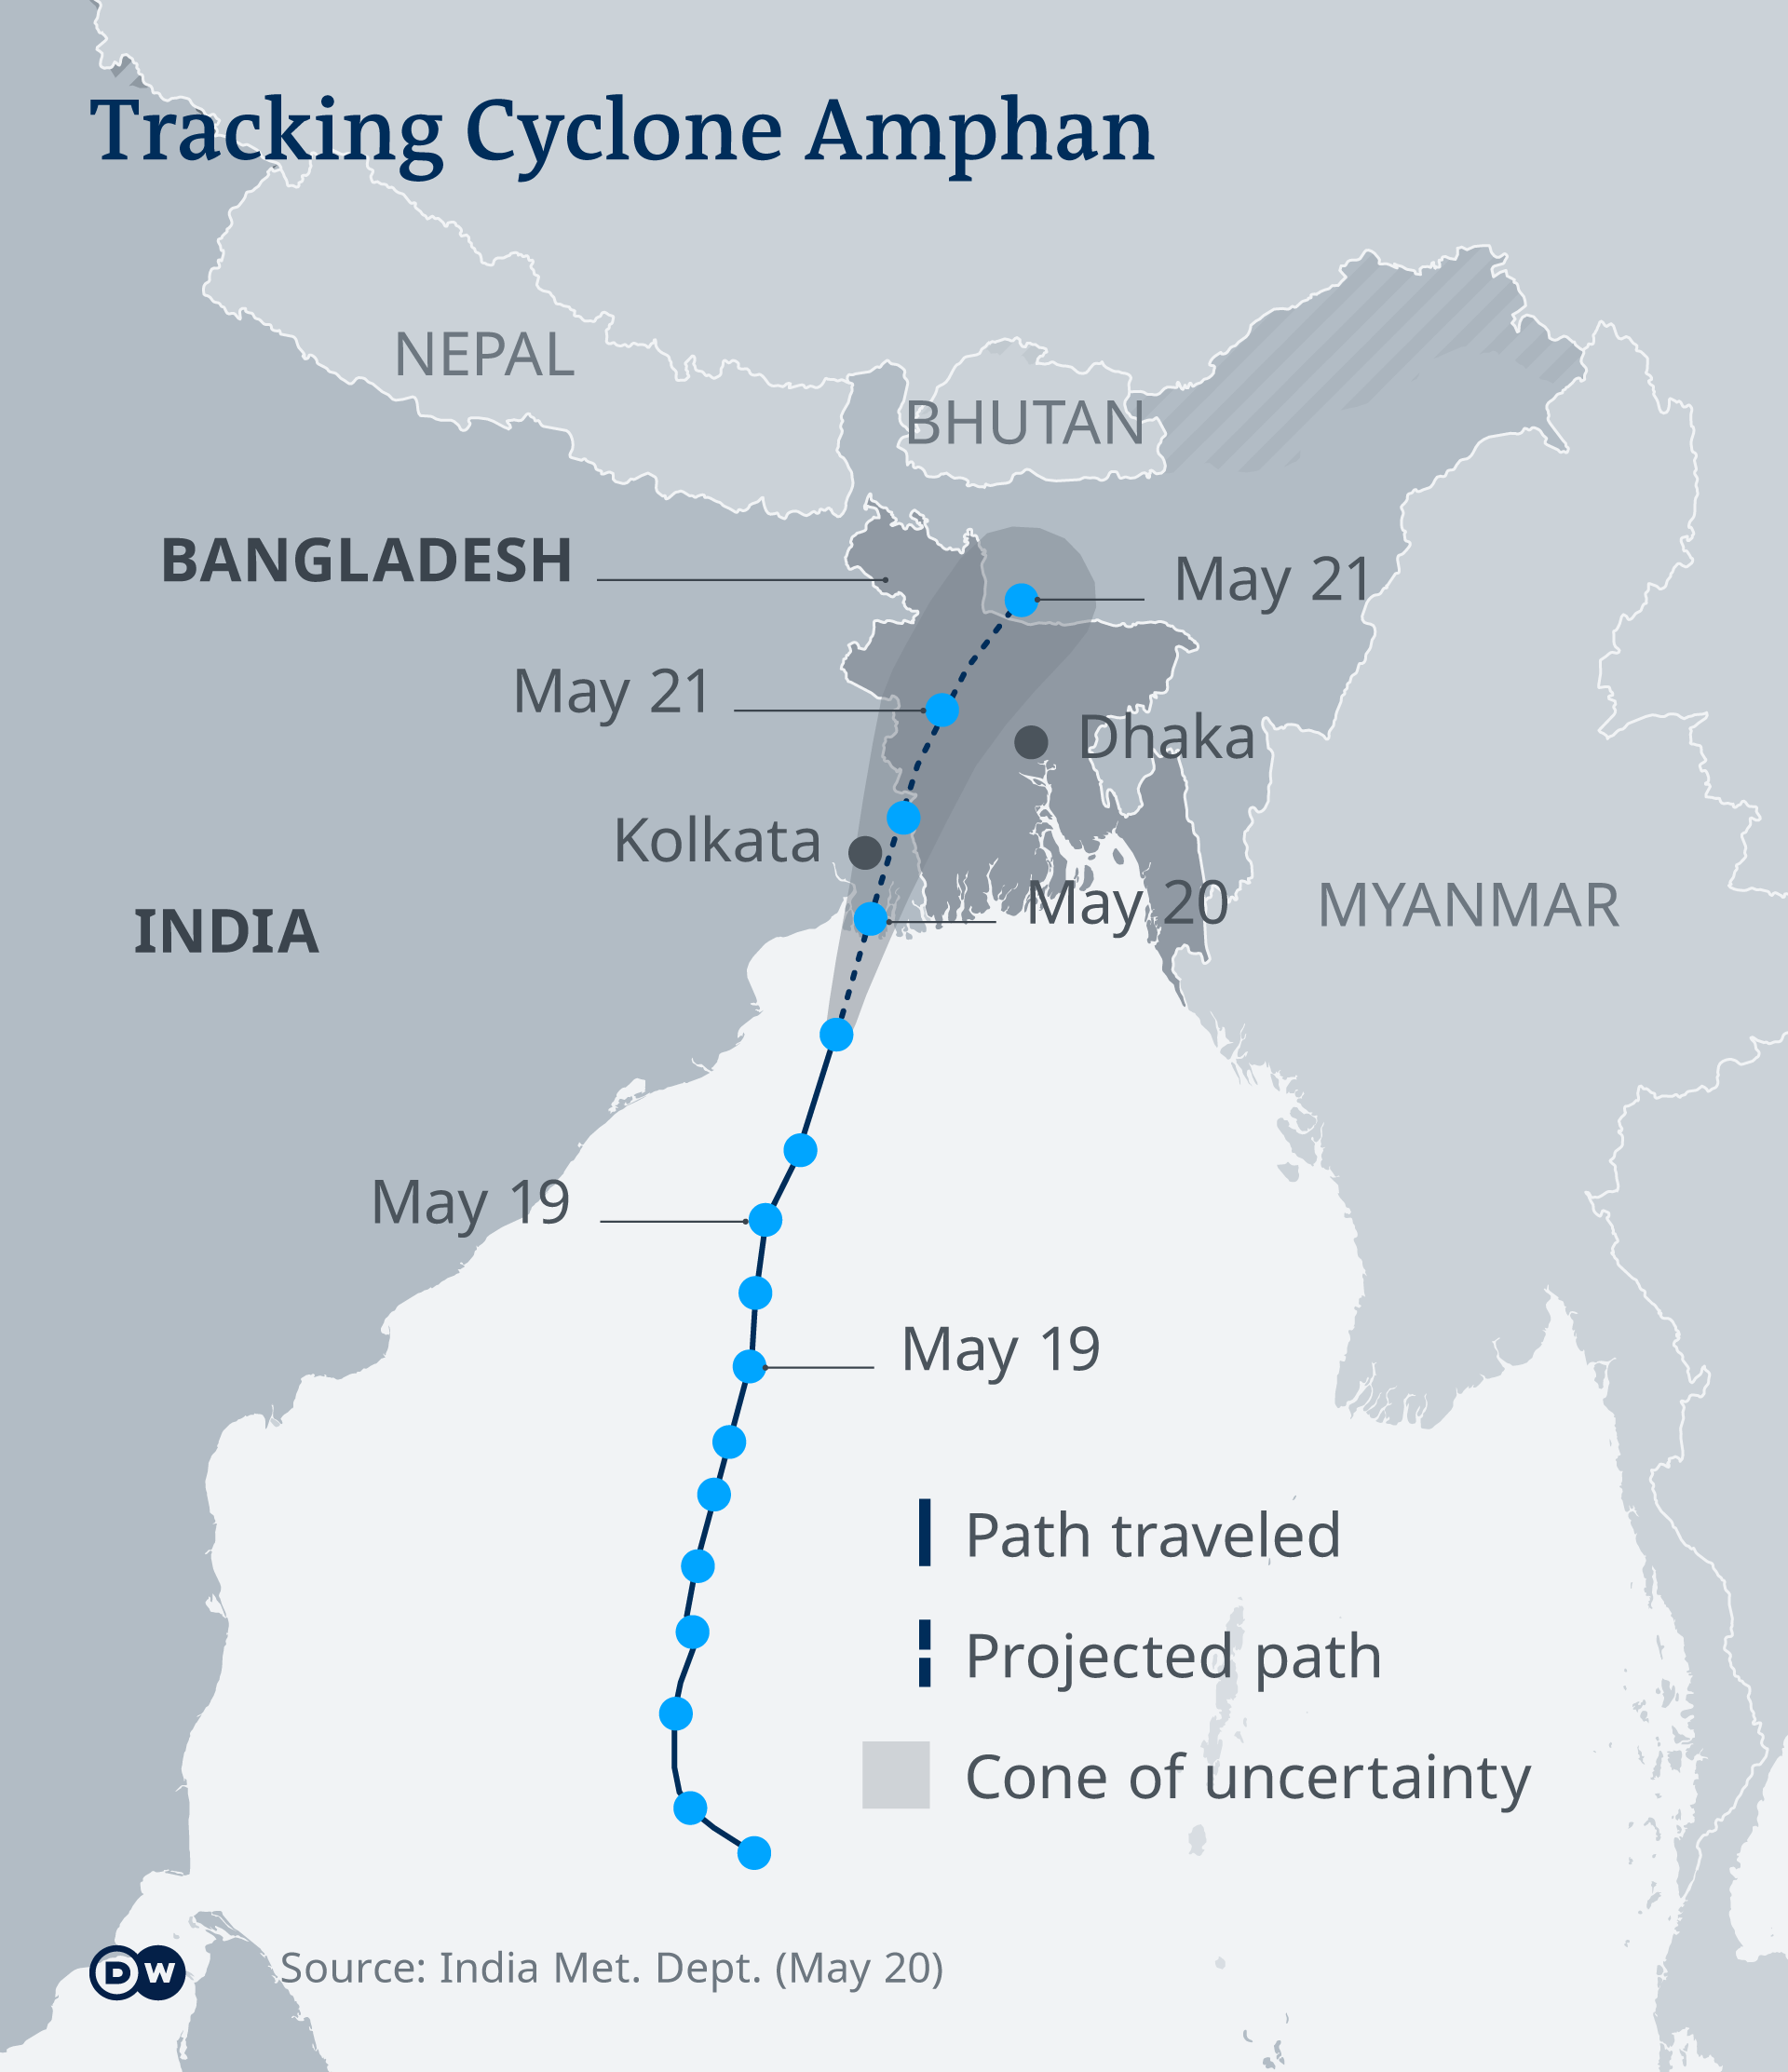 Infografik Zyklon Amphan Stand 20.05.2020 EN